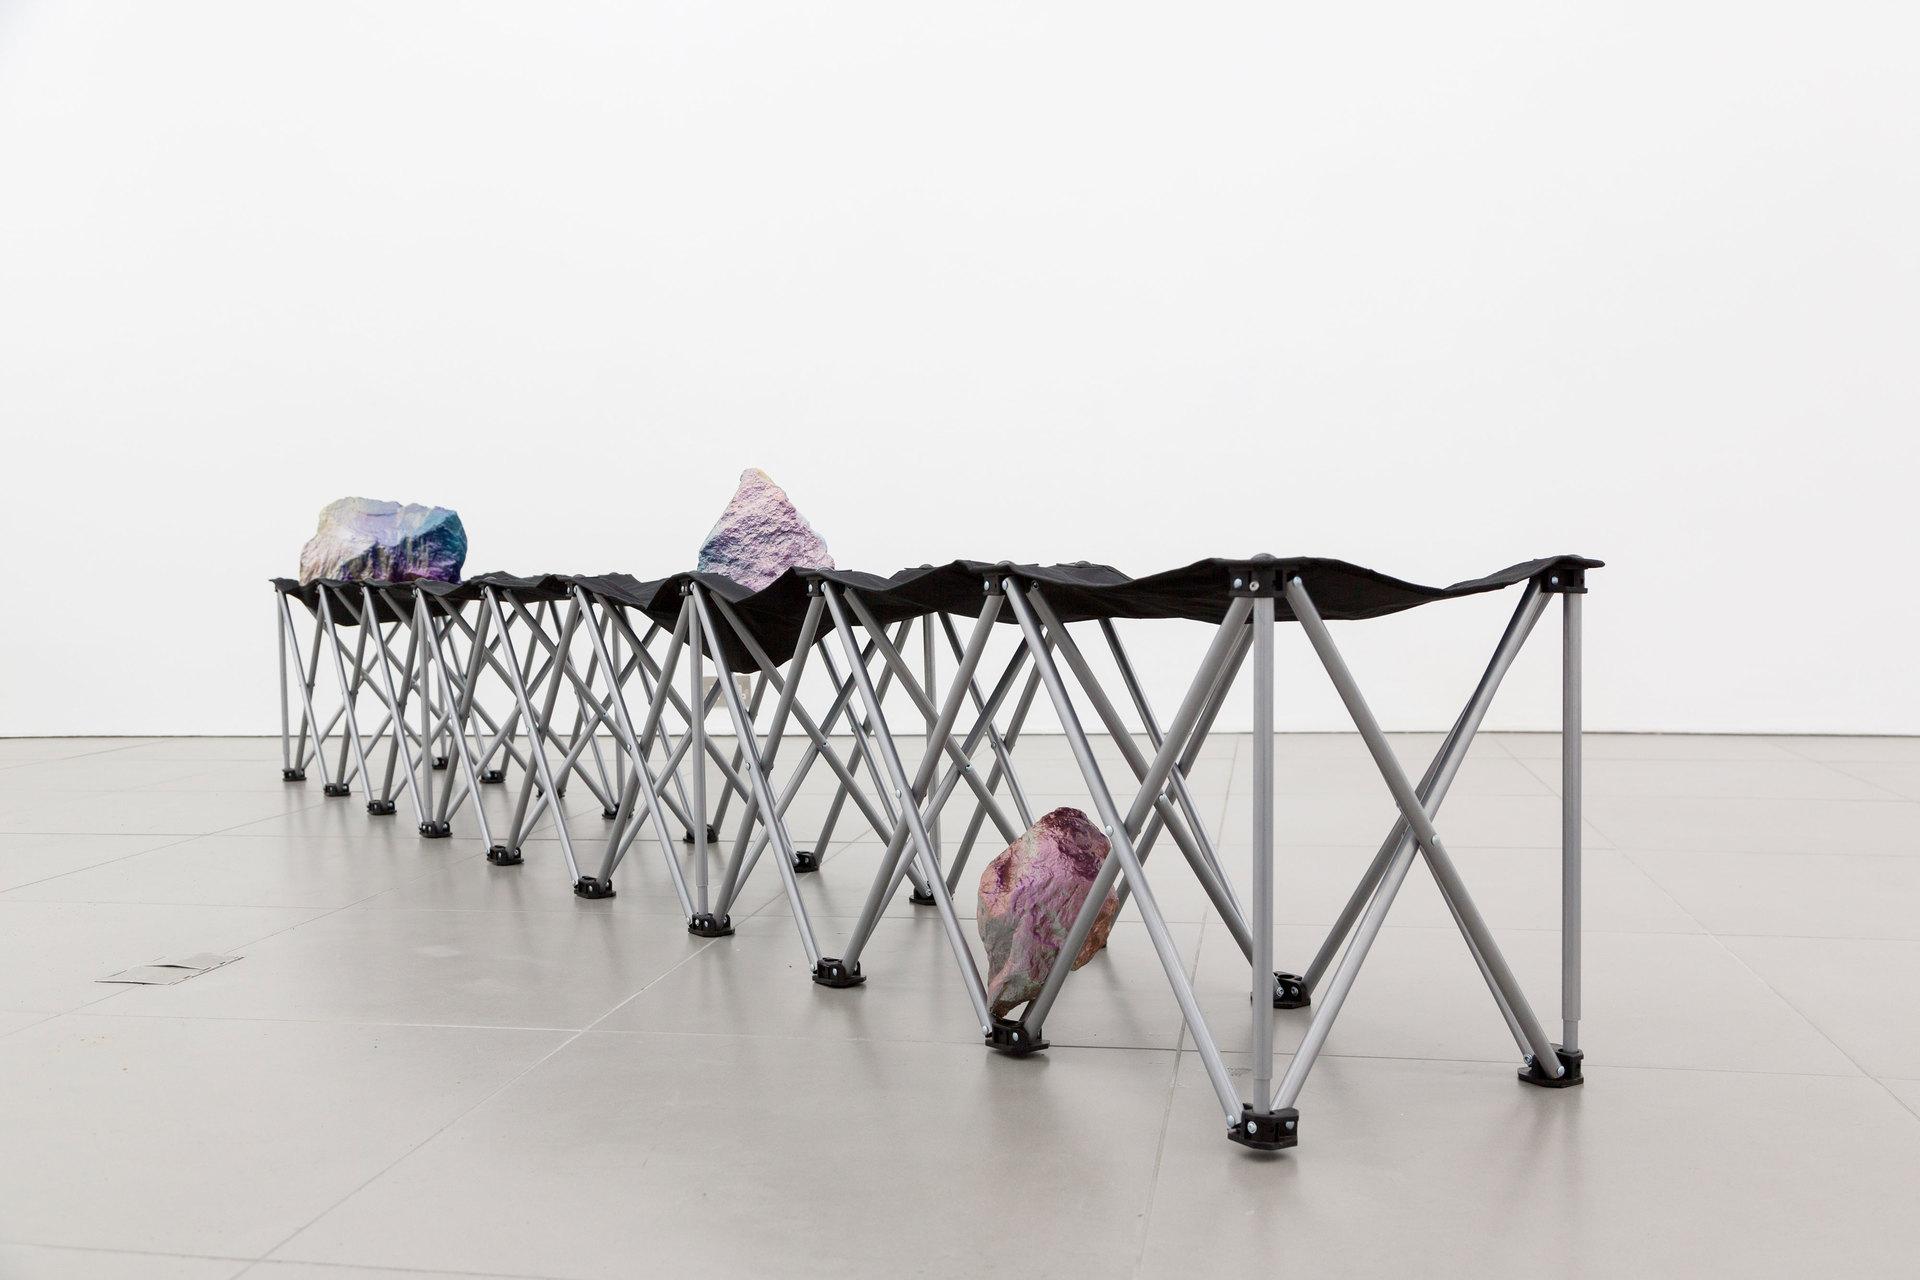 Santiago Taccetti, Reboot Horizon, 'Untitled (Chicago Boys I)', 2014,  enamel on stone, aluminium, steel, plastic, nylon, Cell Project Space